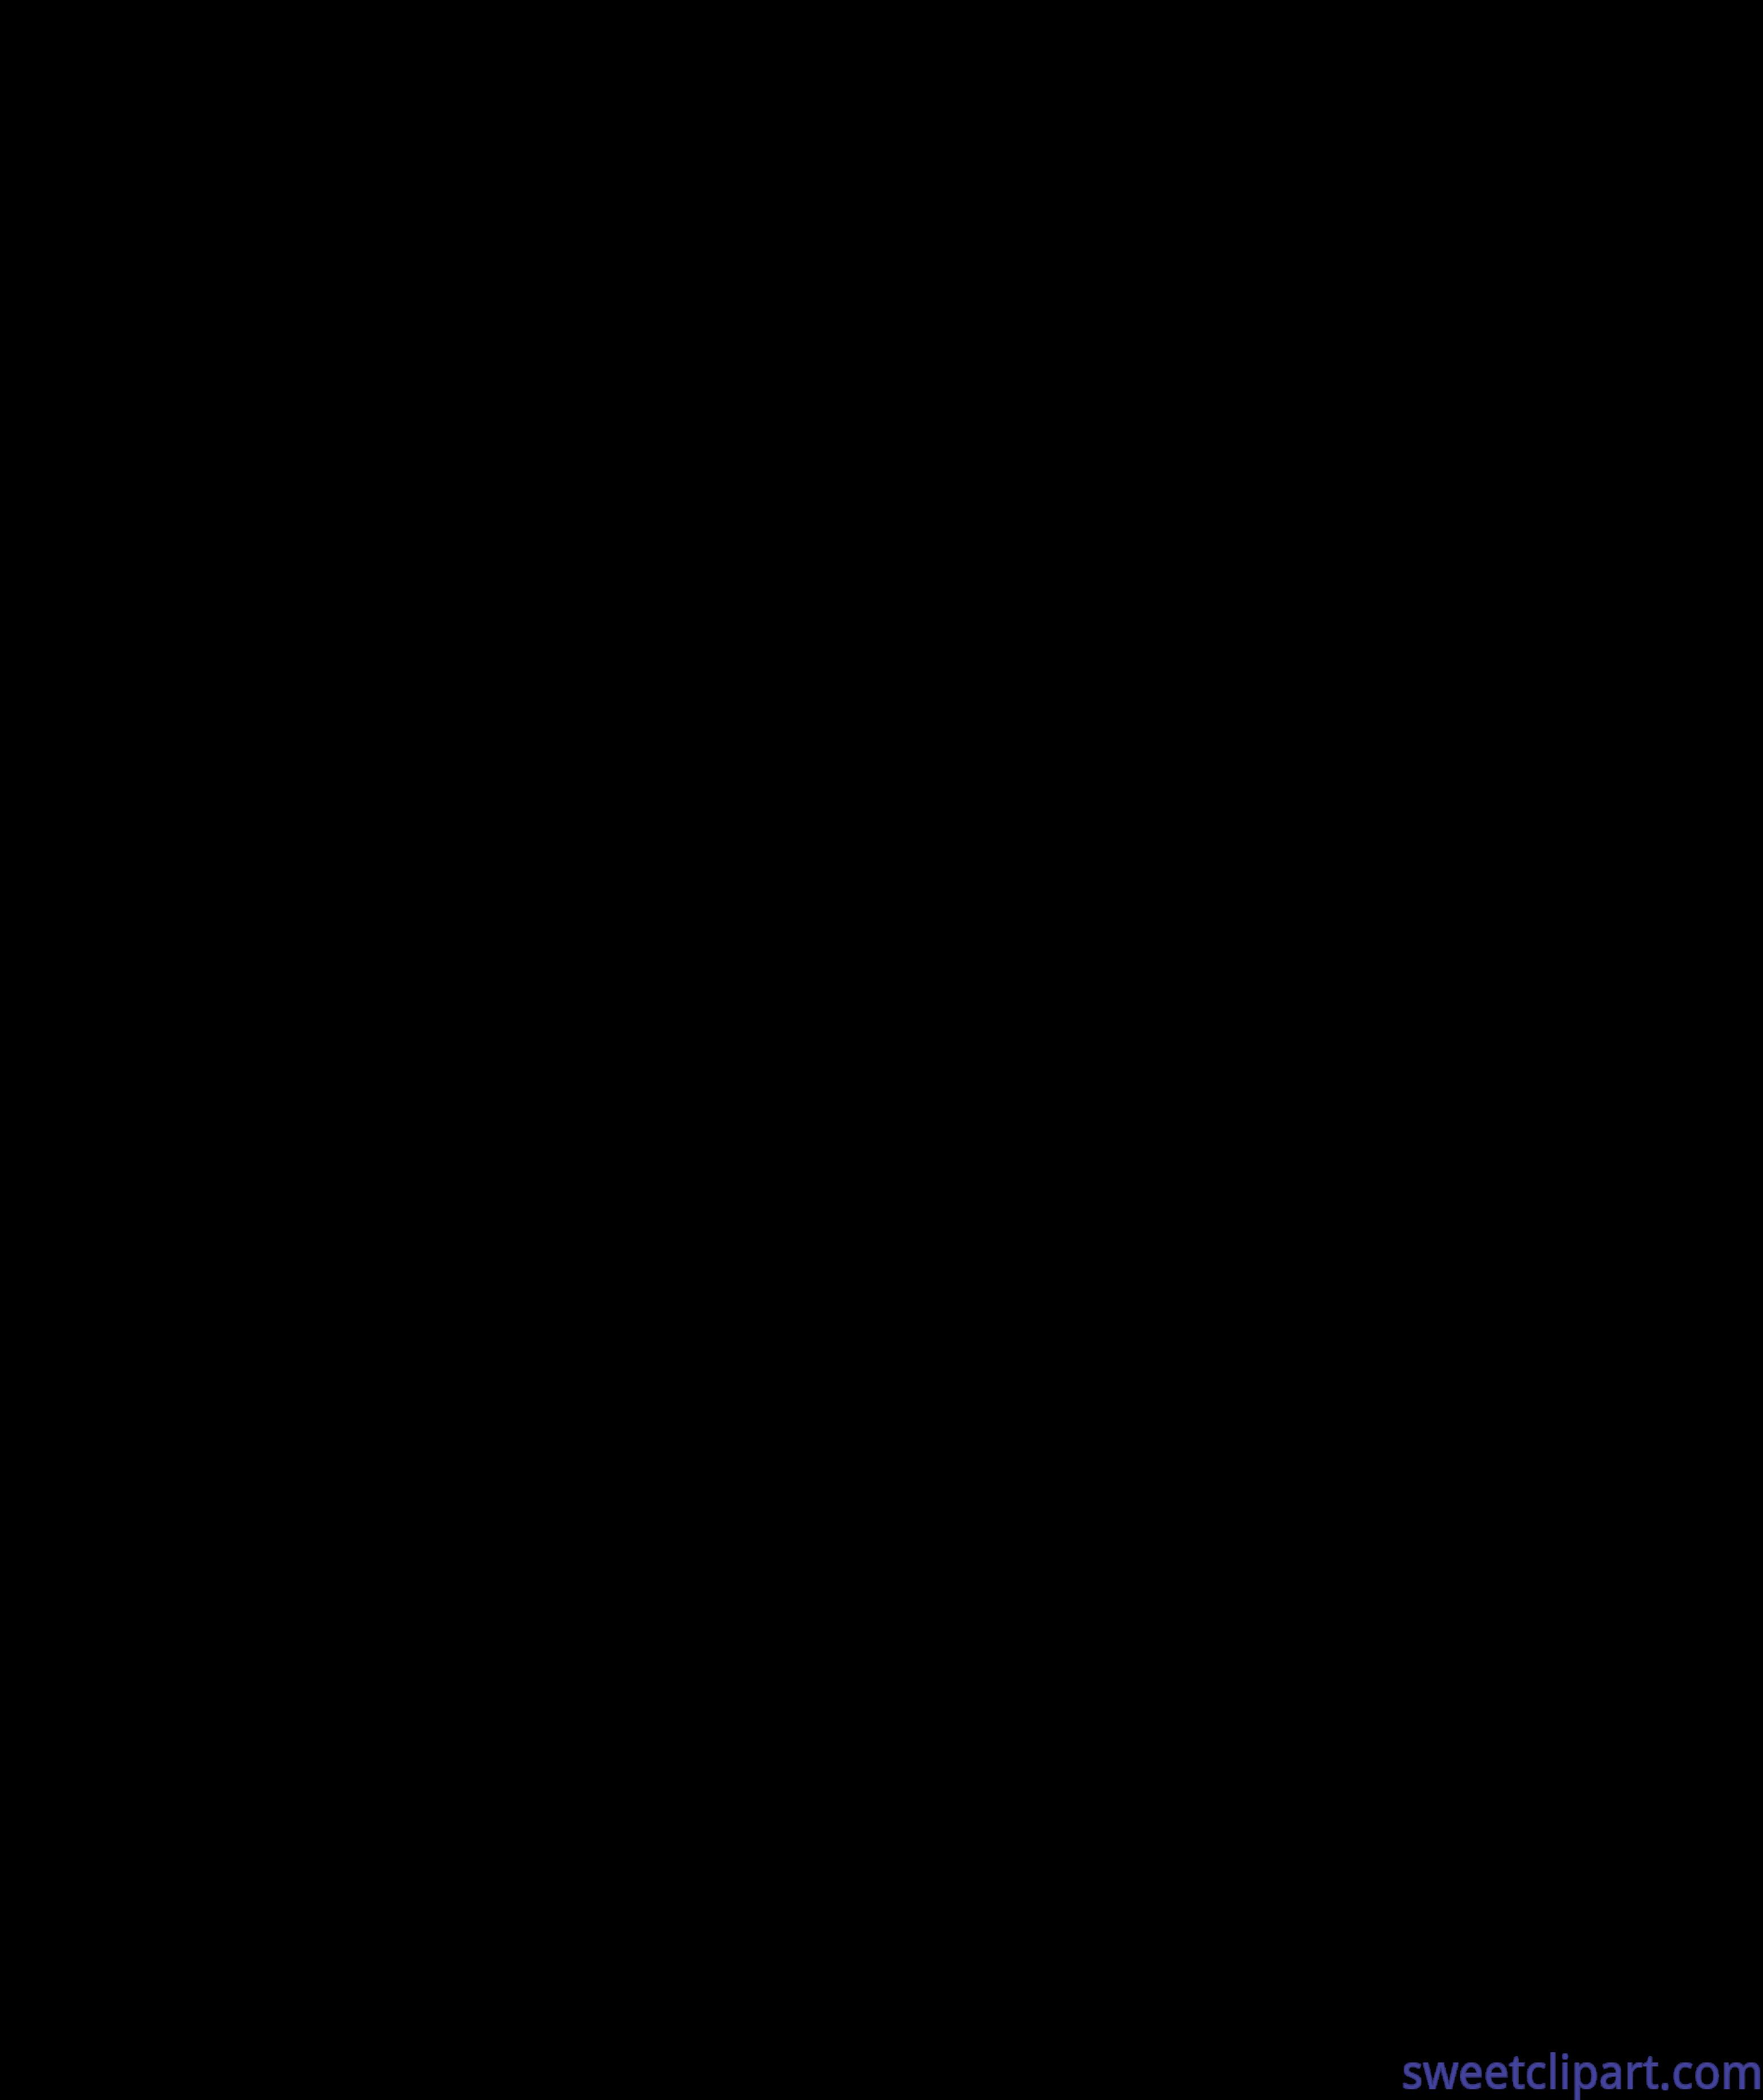 Pineapple clipart silhouette. Apple black clip art